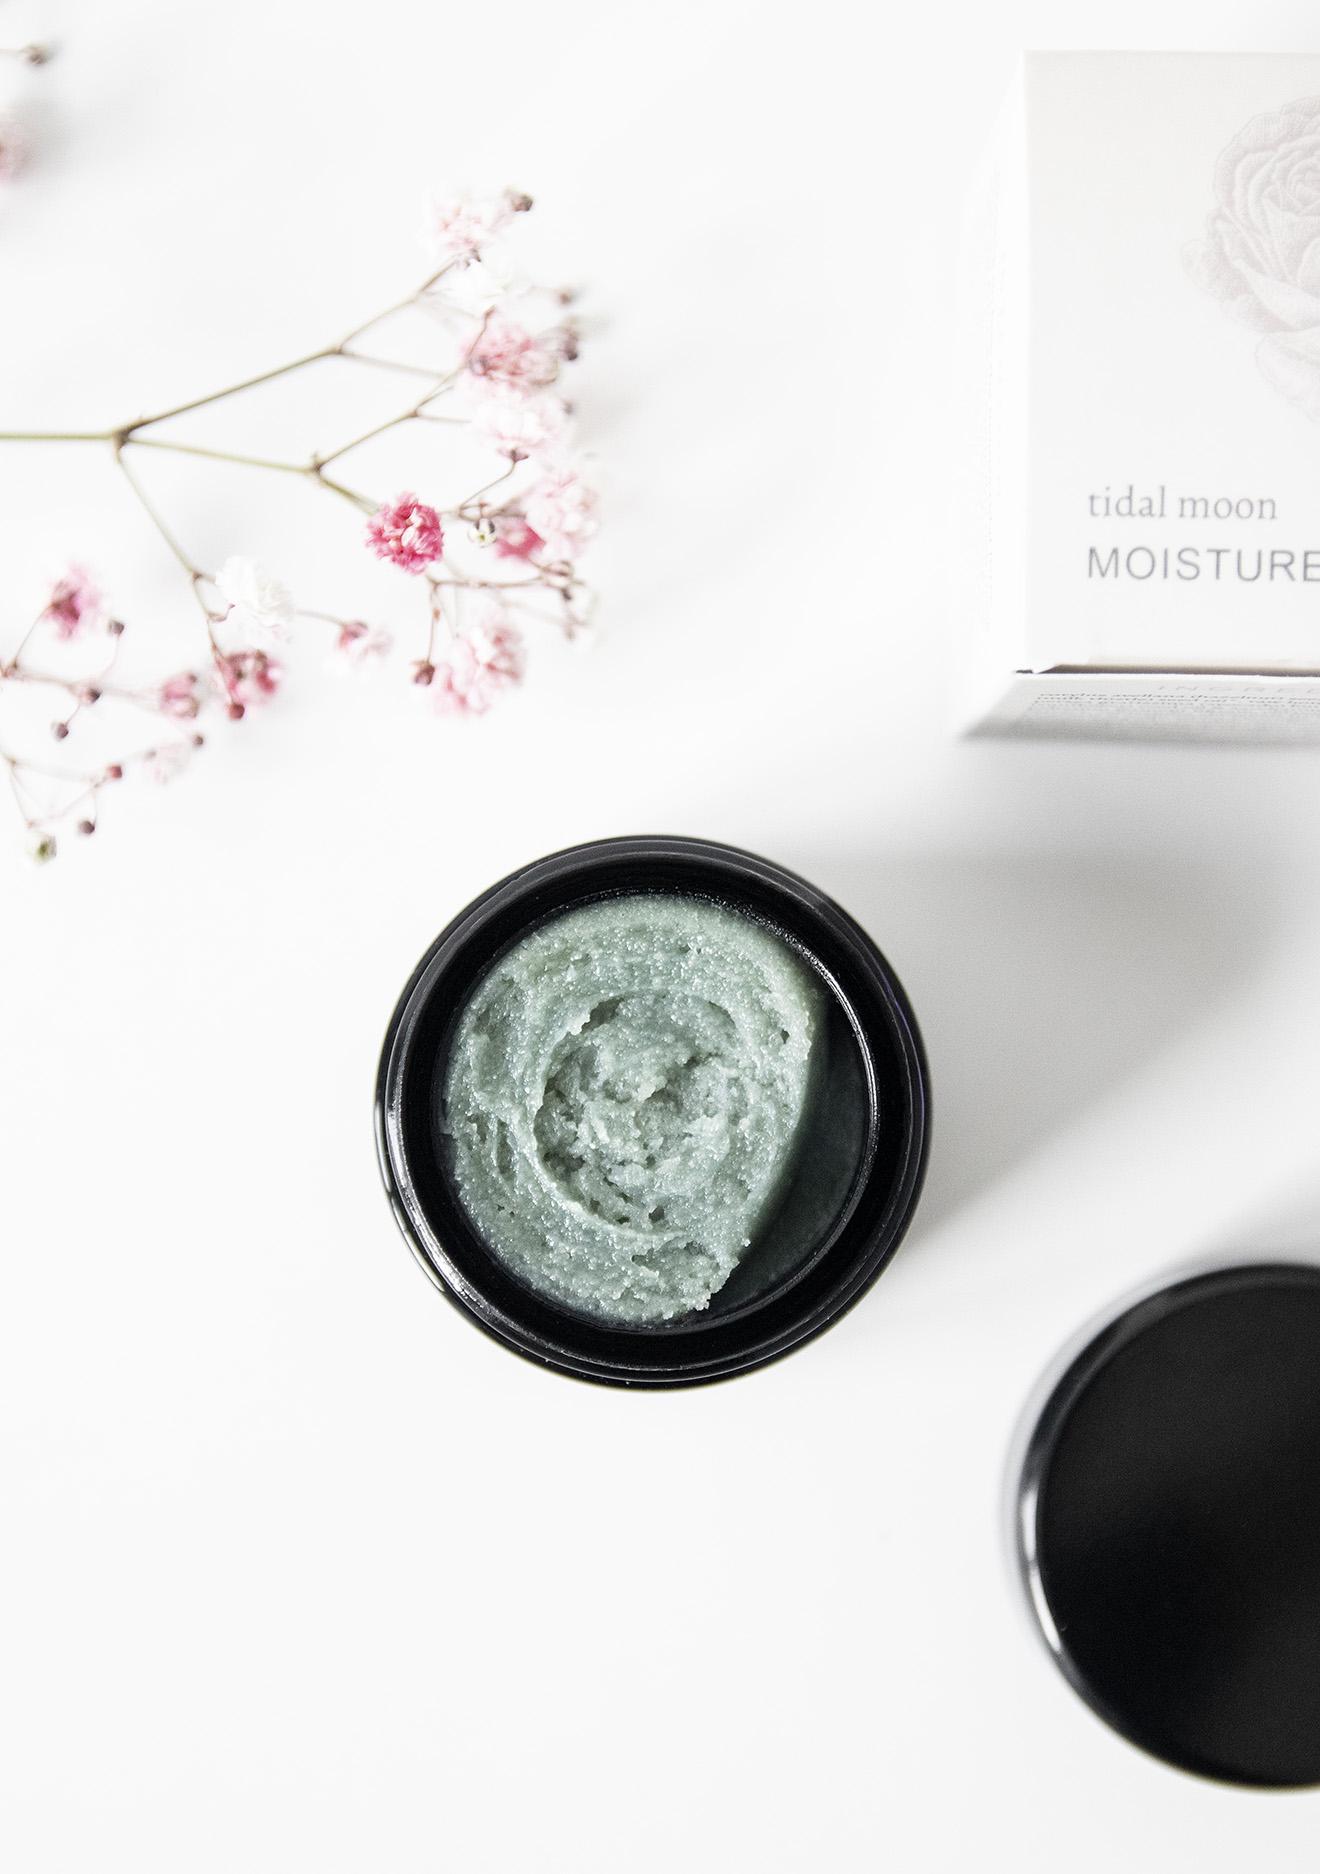 Live Botanical Tidal Moon Organic Moisture Mask